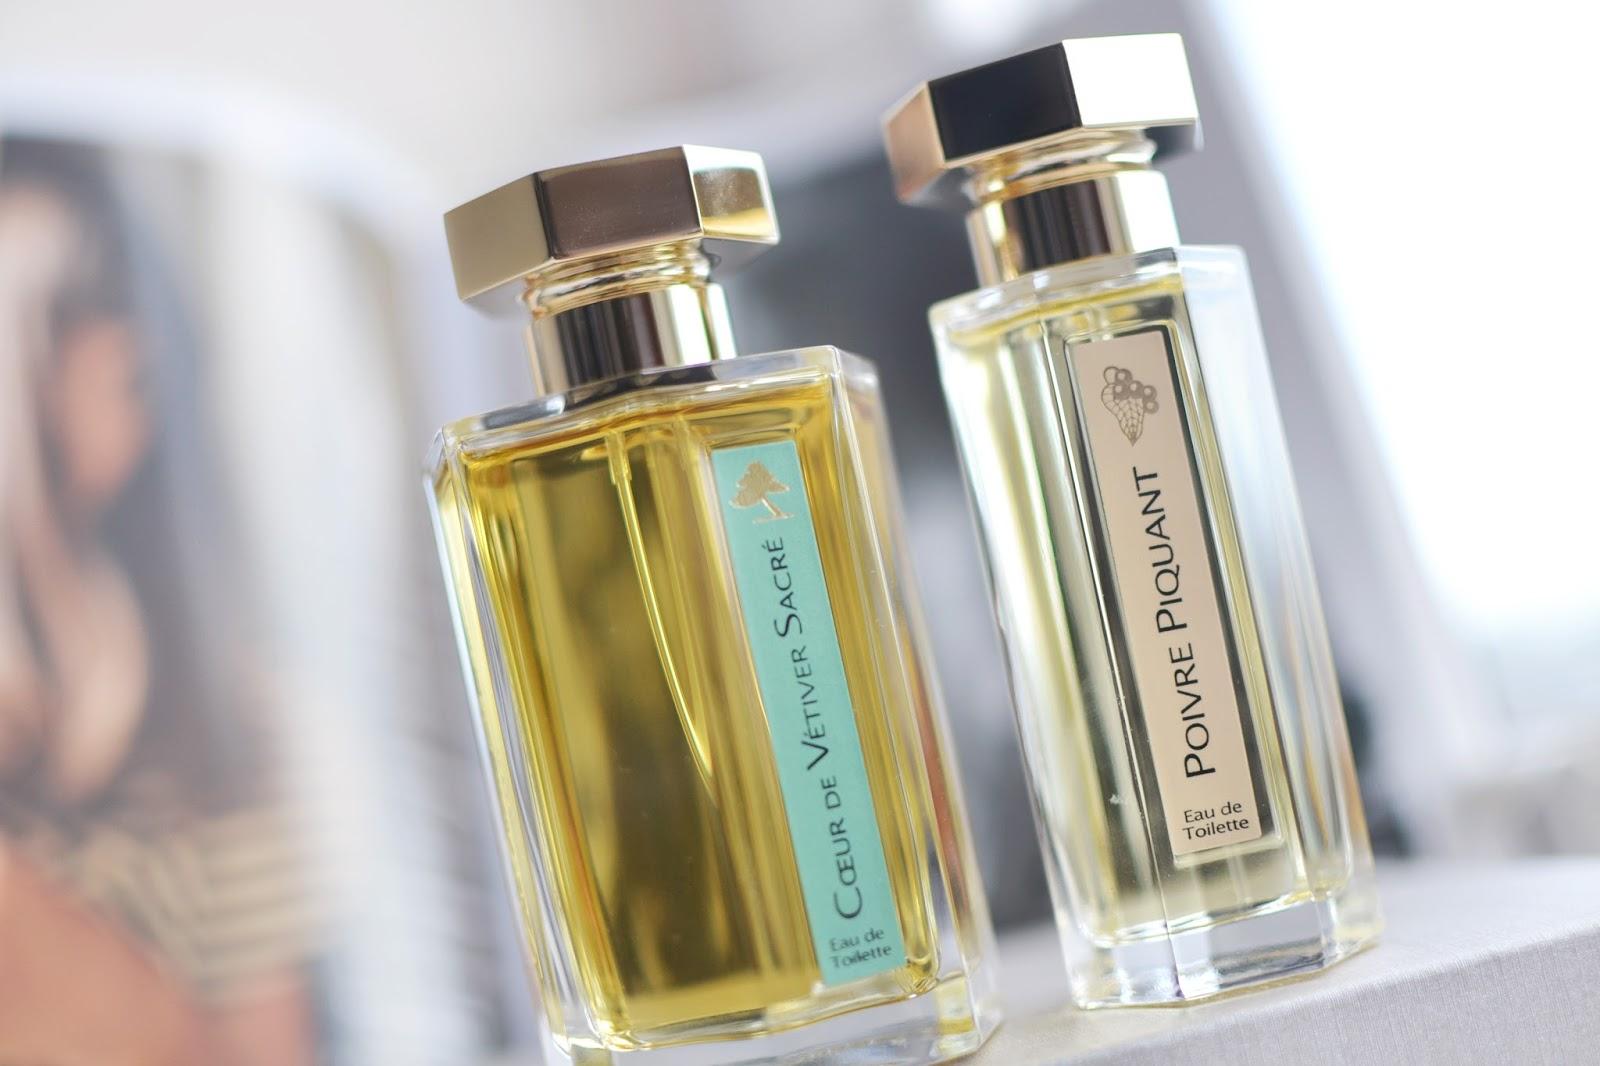 l 39 artisan parfumeur sale on vente privee temporary secretary uk fashion beauty blogger. Black Bedroom Furniture Sets. Home Design Ideas